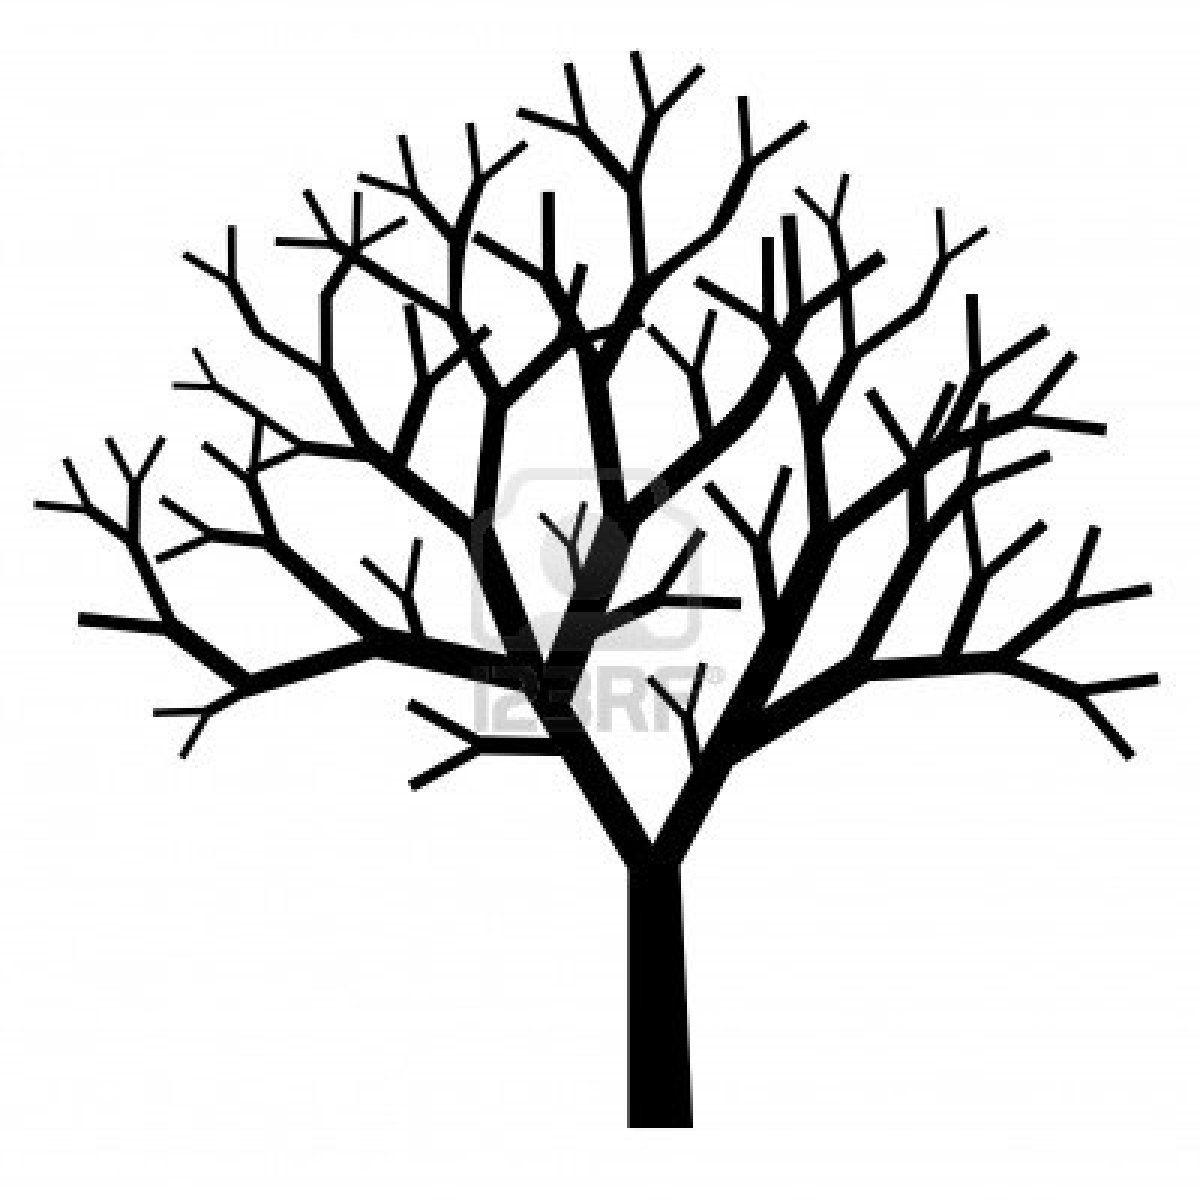 1200x1200 Tree Silhouette Stock Photo